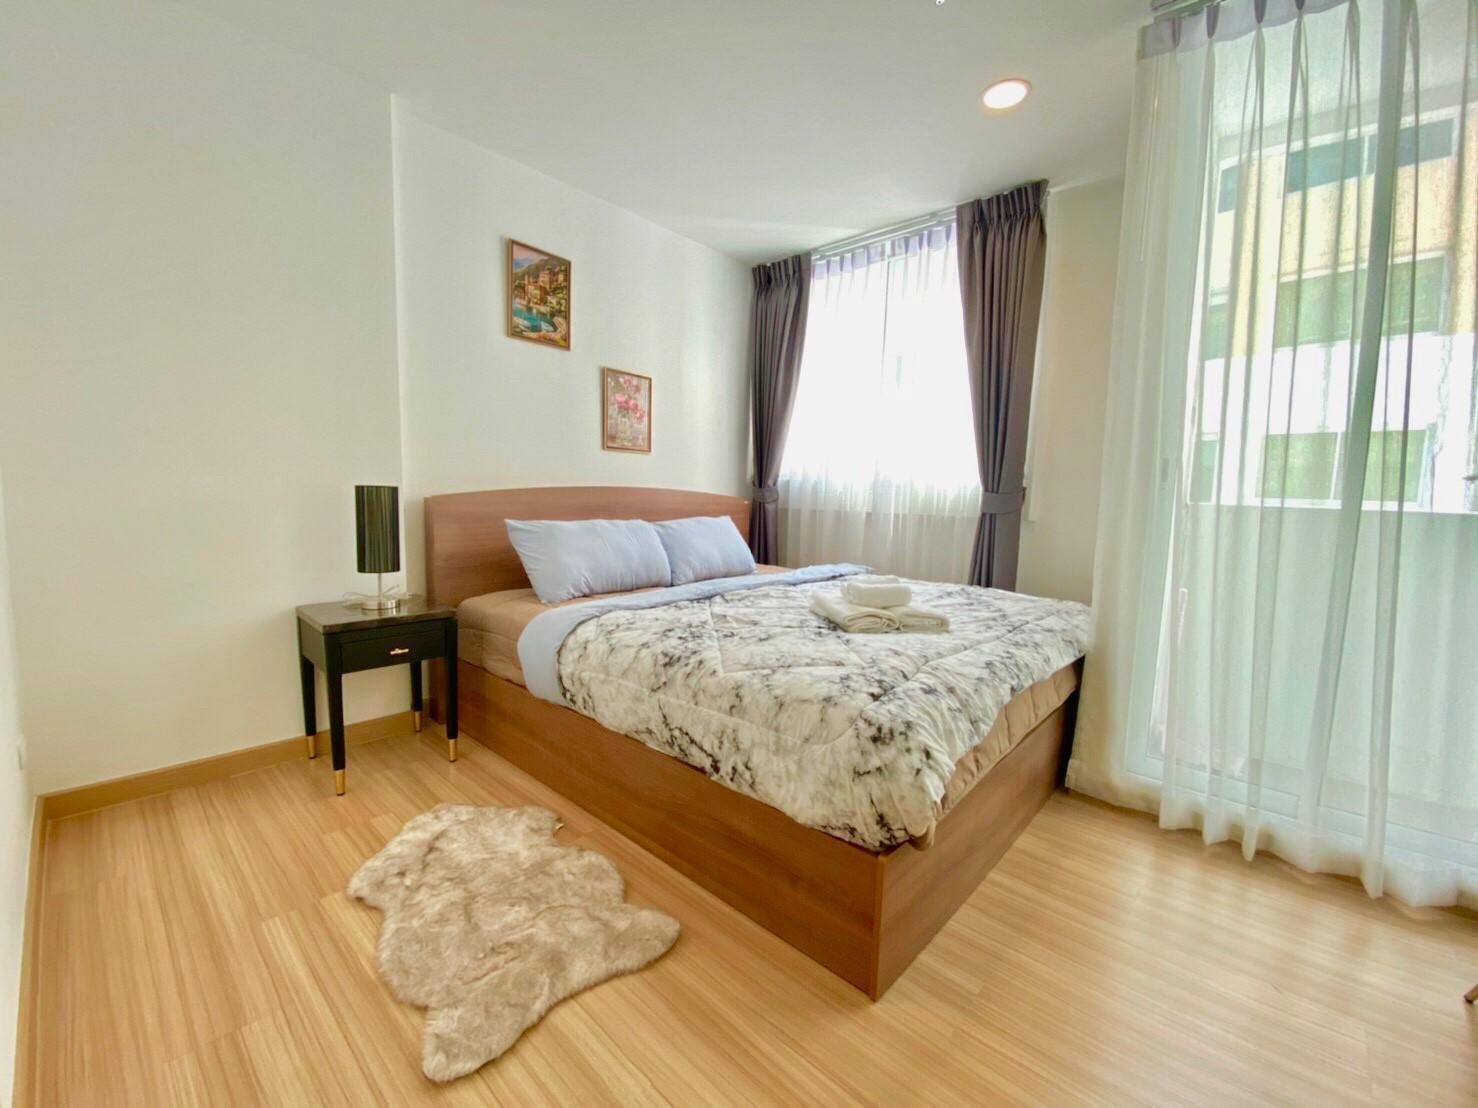 Chateau in Town Rama 8 by  JR416 อพาร์ตเมนต์ 1 ห้องนอน 1 ห้องน้ำส่วนตัว ขนาด 28 ตร.ม. – ริมแม่น้ำกรุงเทพ